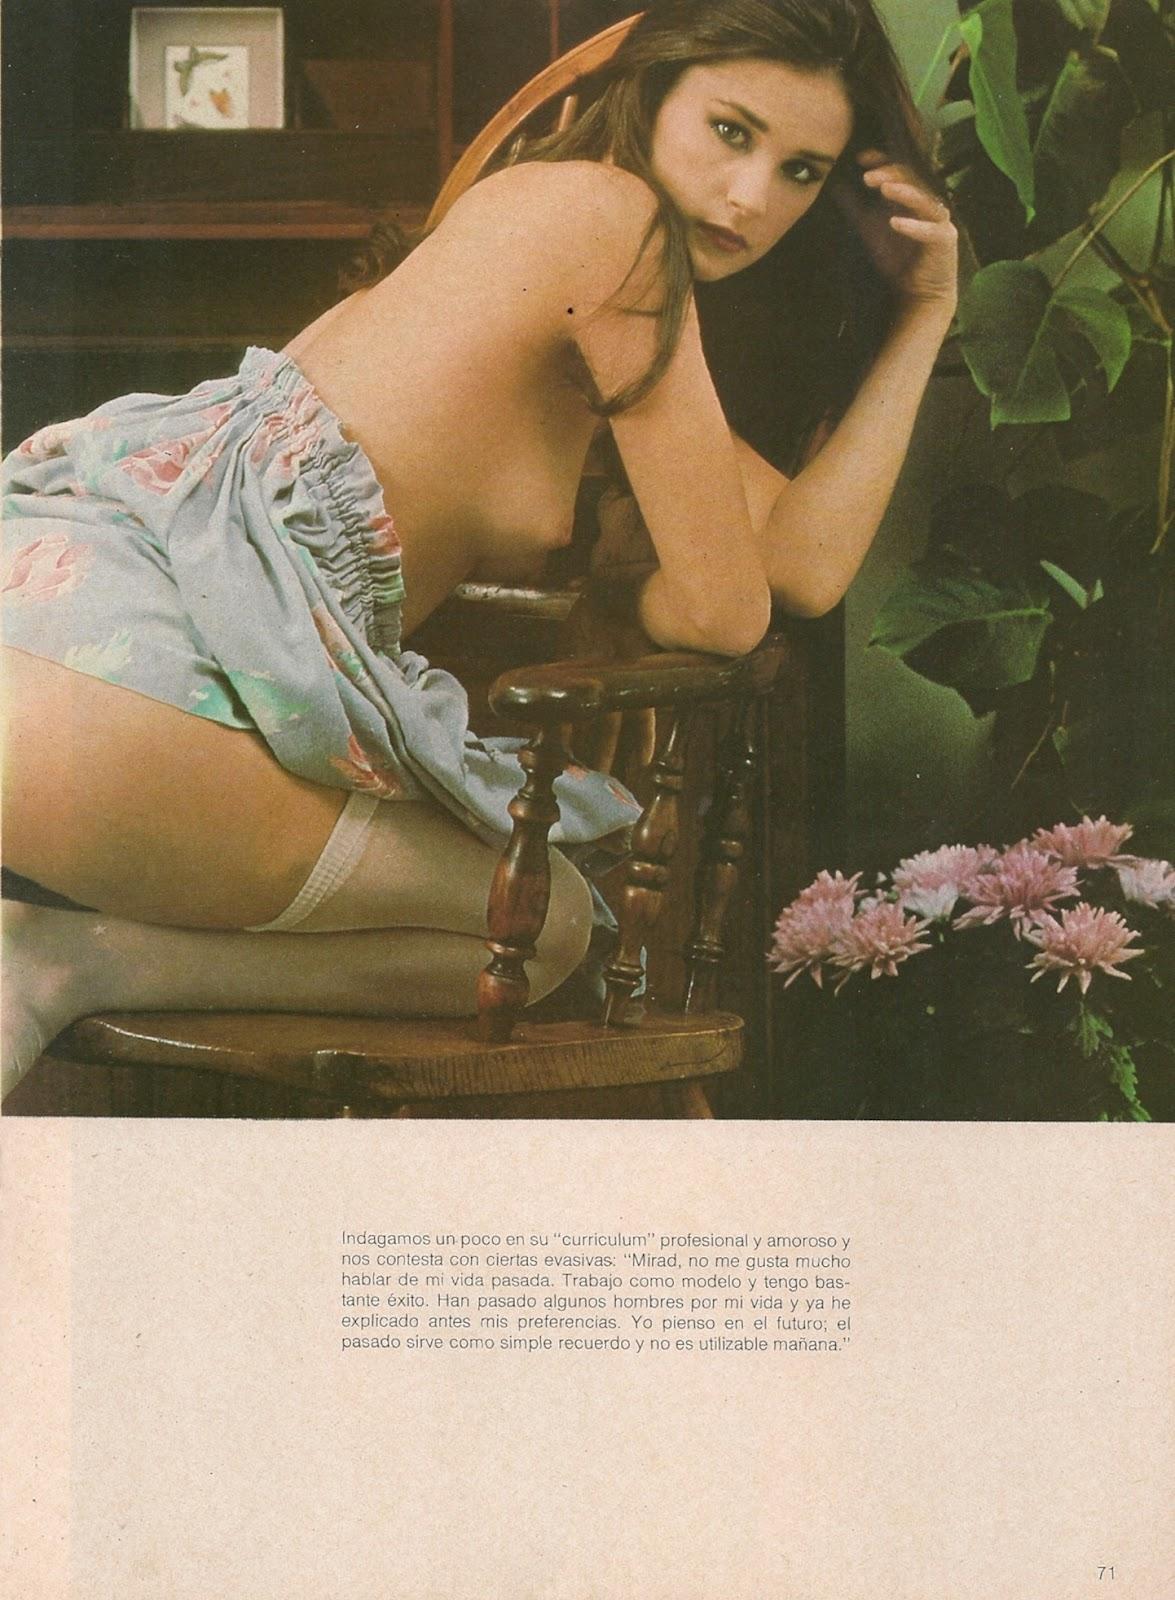 http://4.bp.blogspot.com/-l8oA3qczRCA/UCFXz0ZQakI/AAAAAAAAVnw/vf_t57f9q5U/s1600/Demi+Moore+Nude+Penthouse+Spain,+March+1981+06.jpg